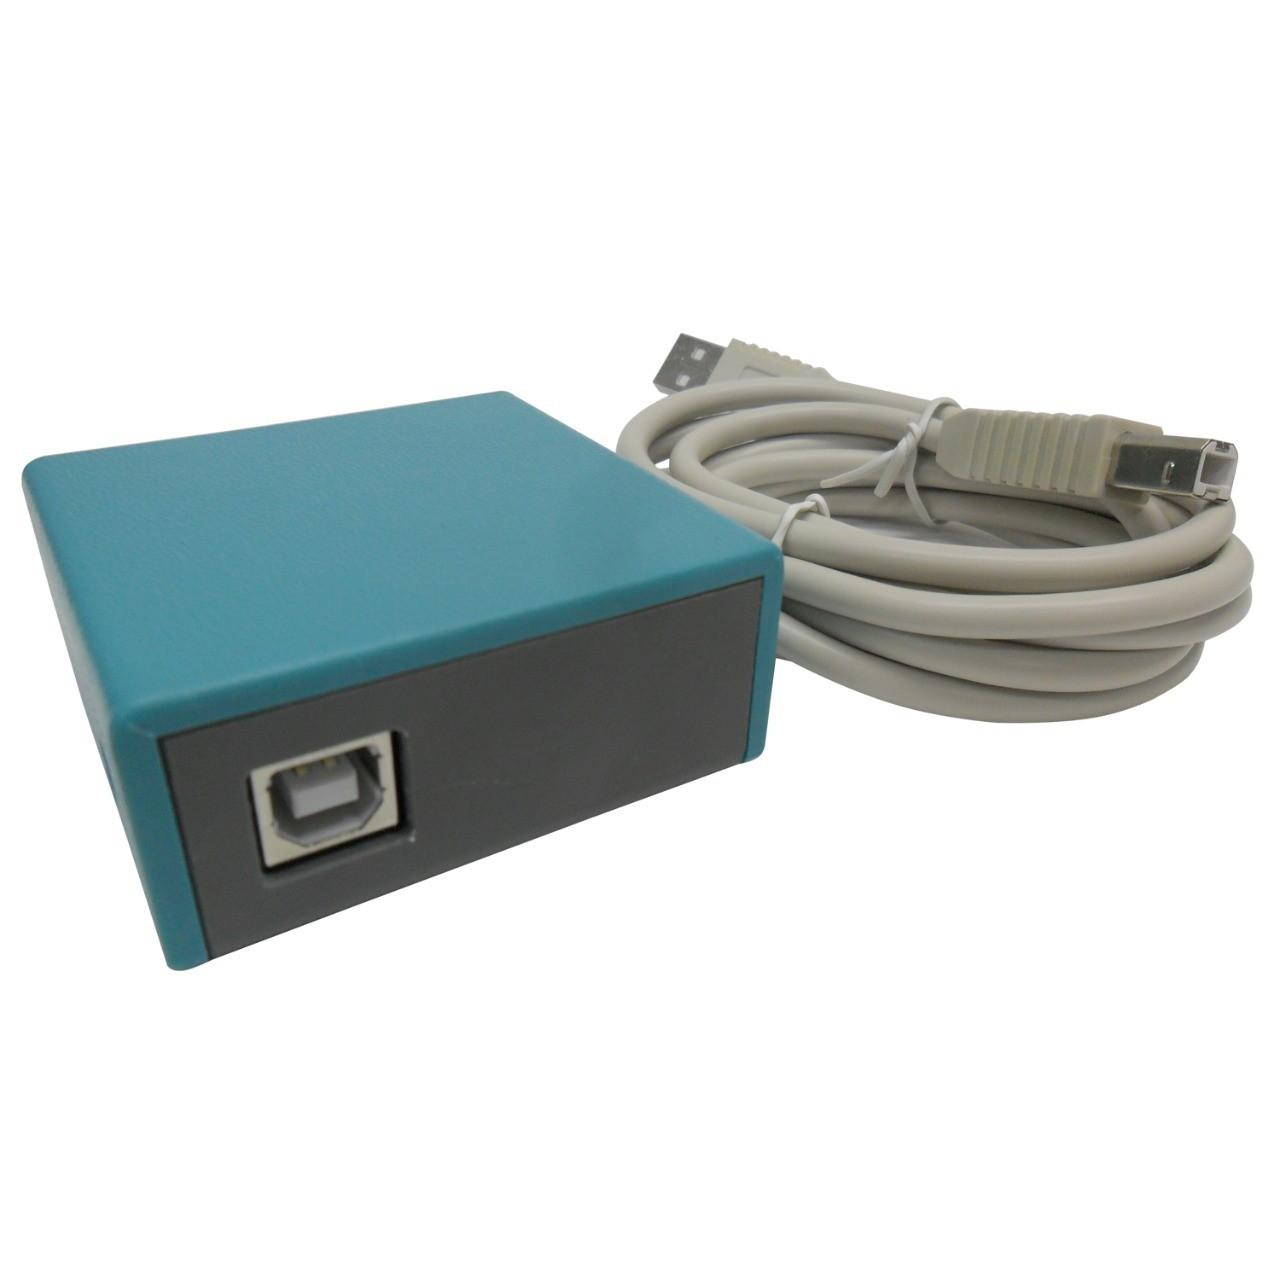 Bina PC1 - FSK USB Identificador de chamadas 1 canal Mamut  - Dragon Store